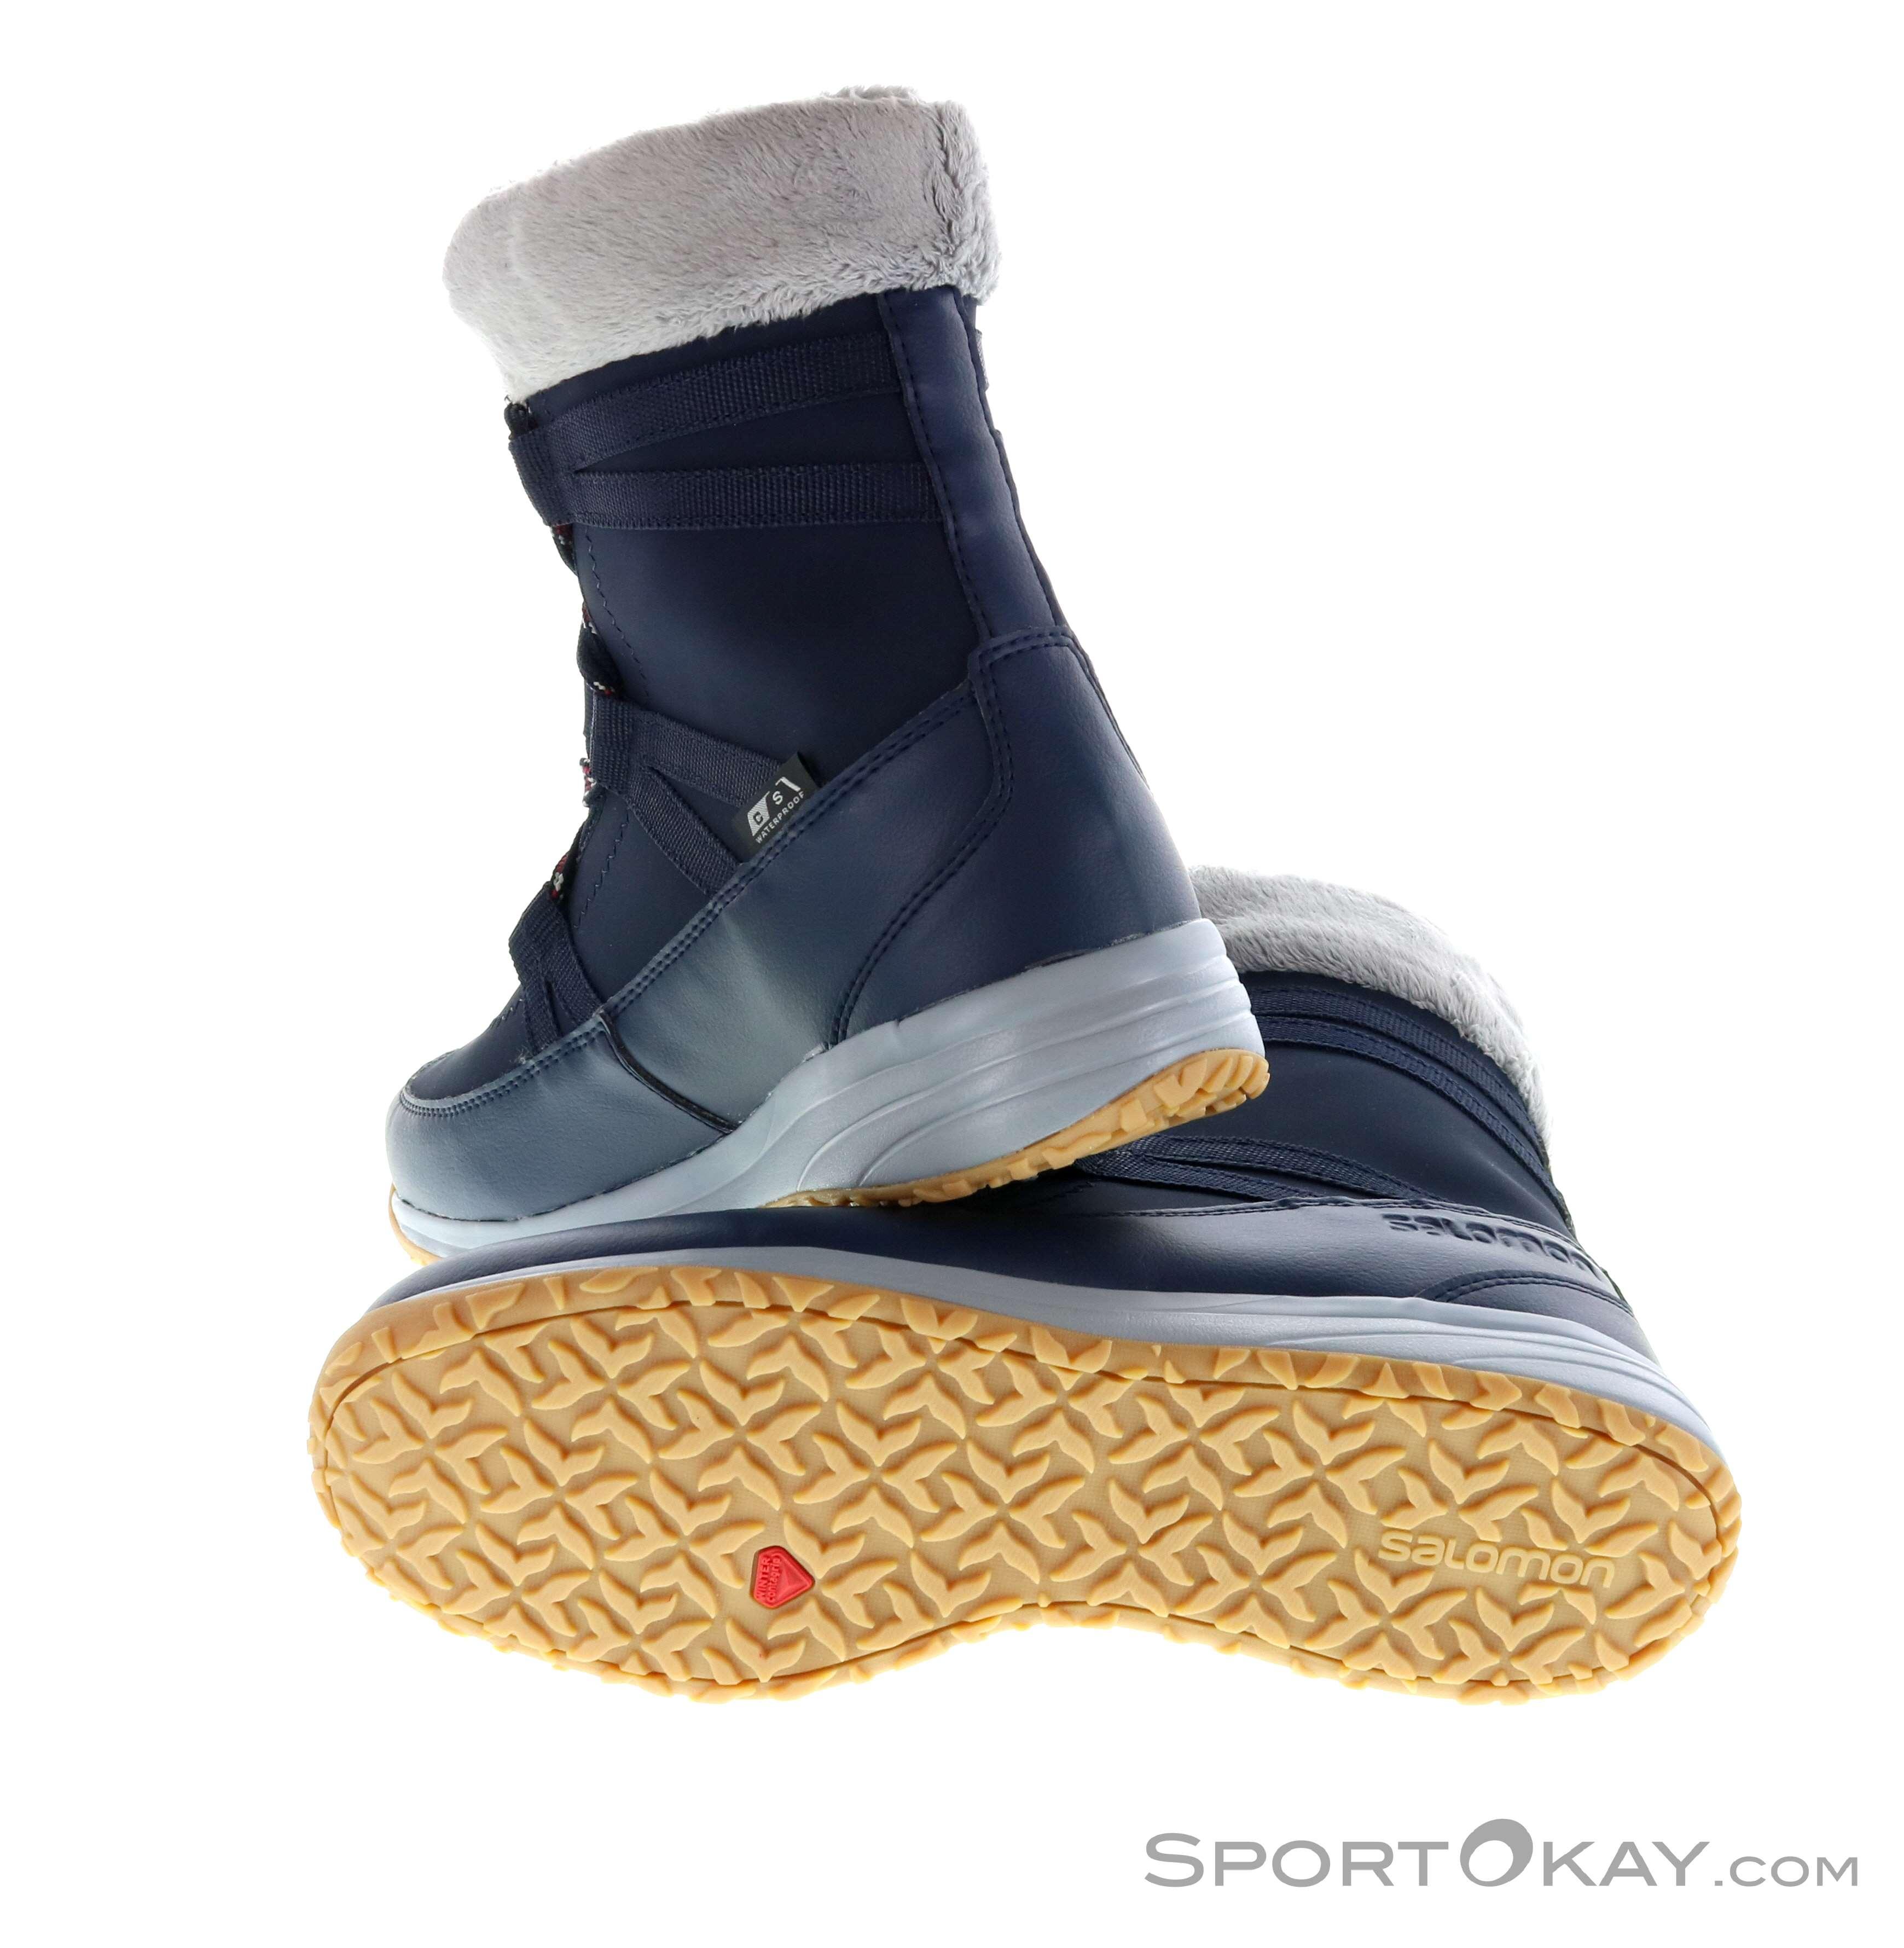 ae2bf5a0b346 Salomon Heika LTR CSWP Womens Winter Shoes - Gore-Tex Boots - Winter ...